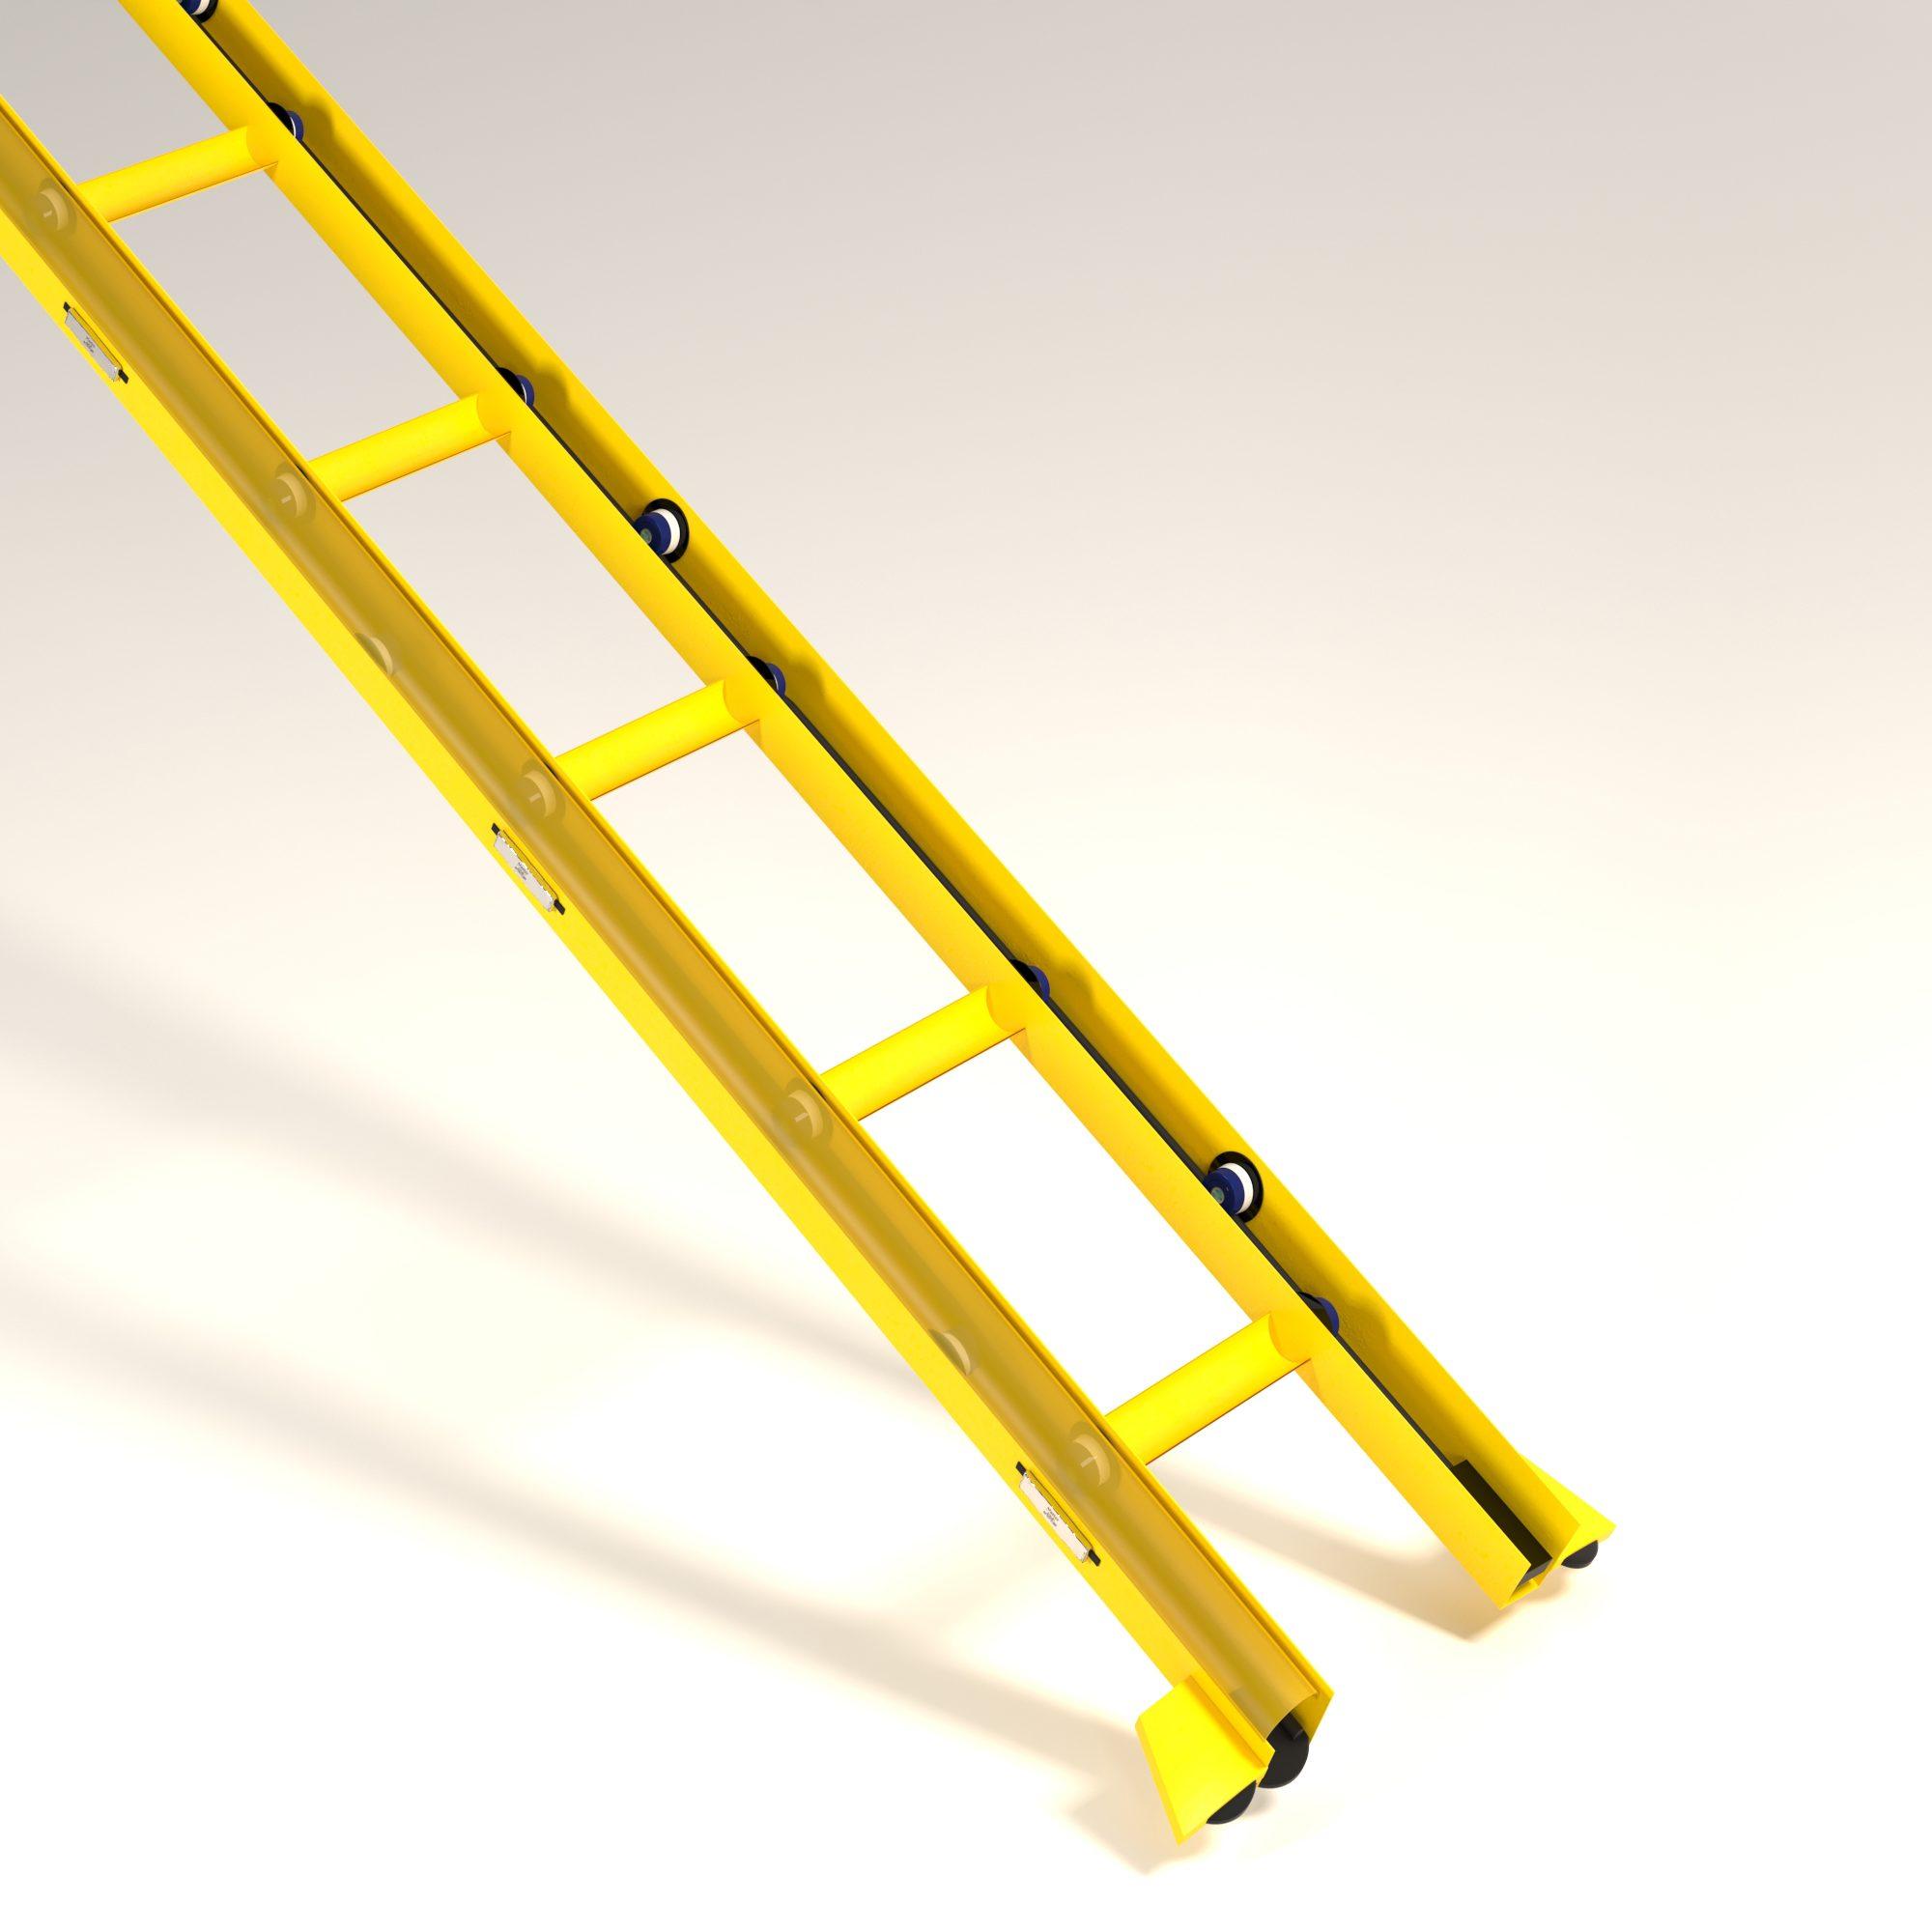 Ladder_02